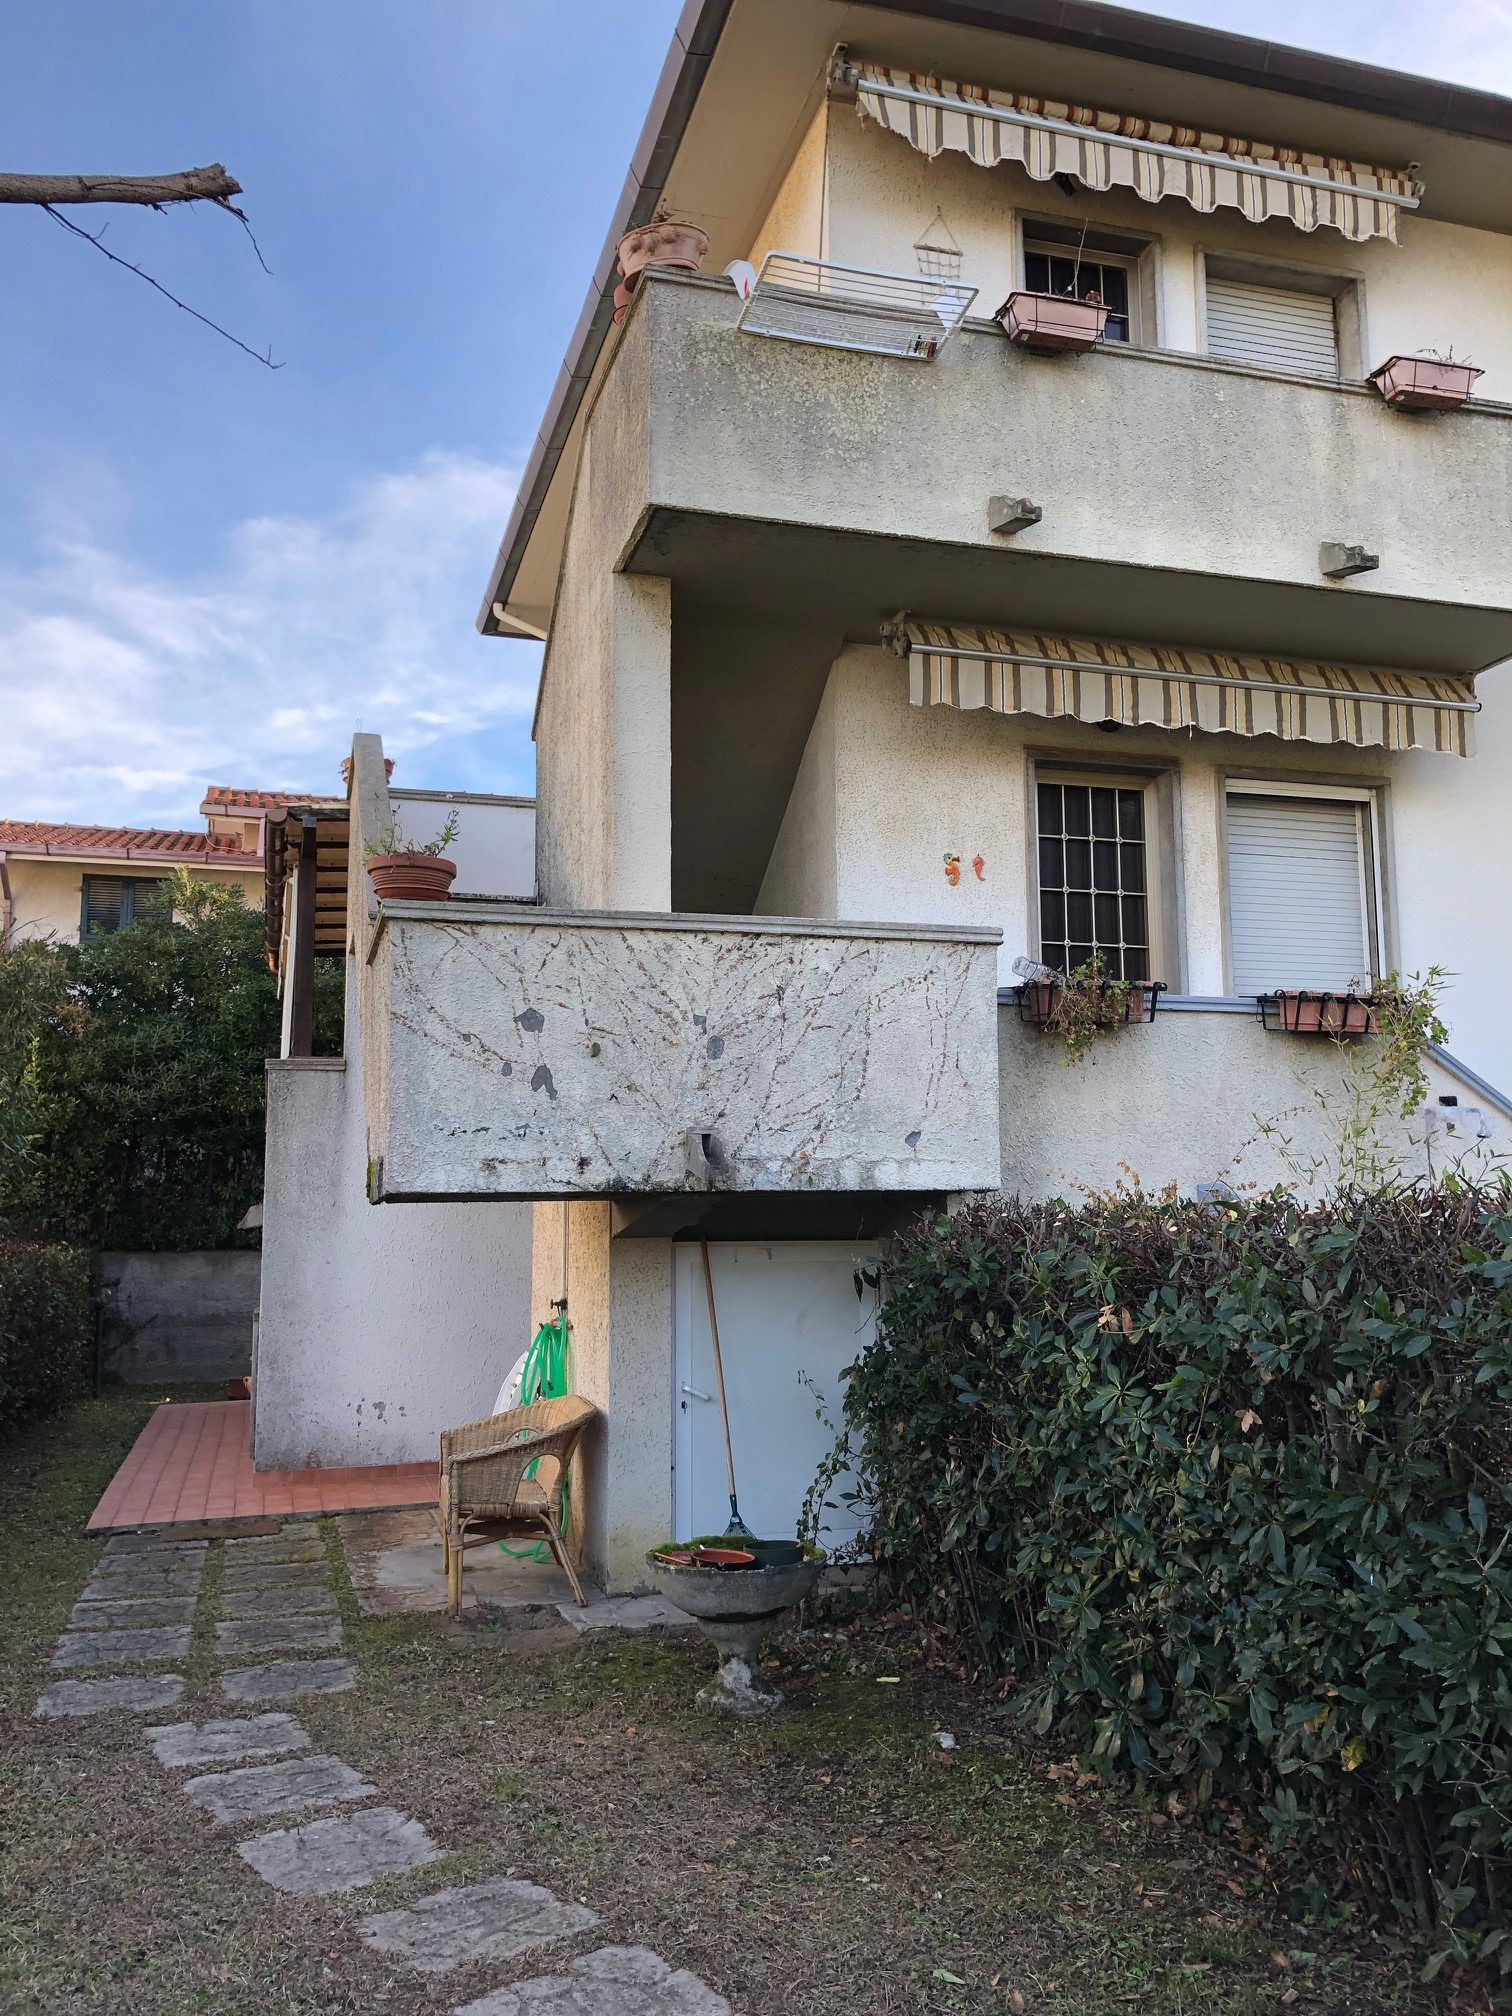 59V – Bilocale con garage e giardino